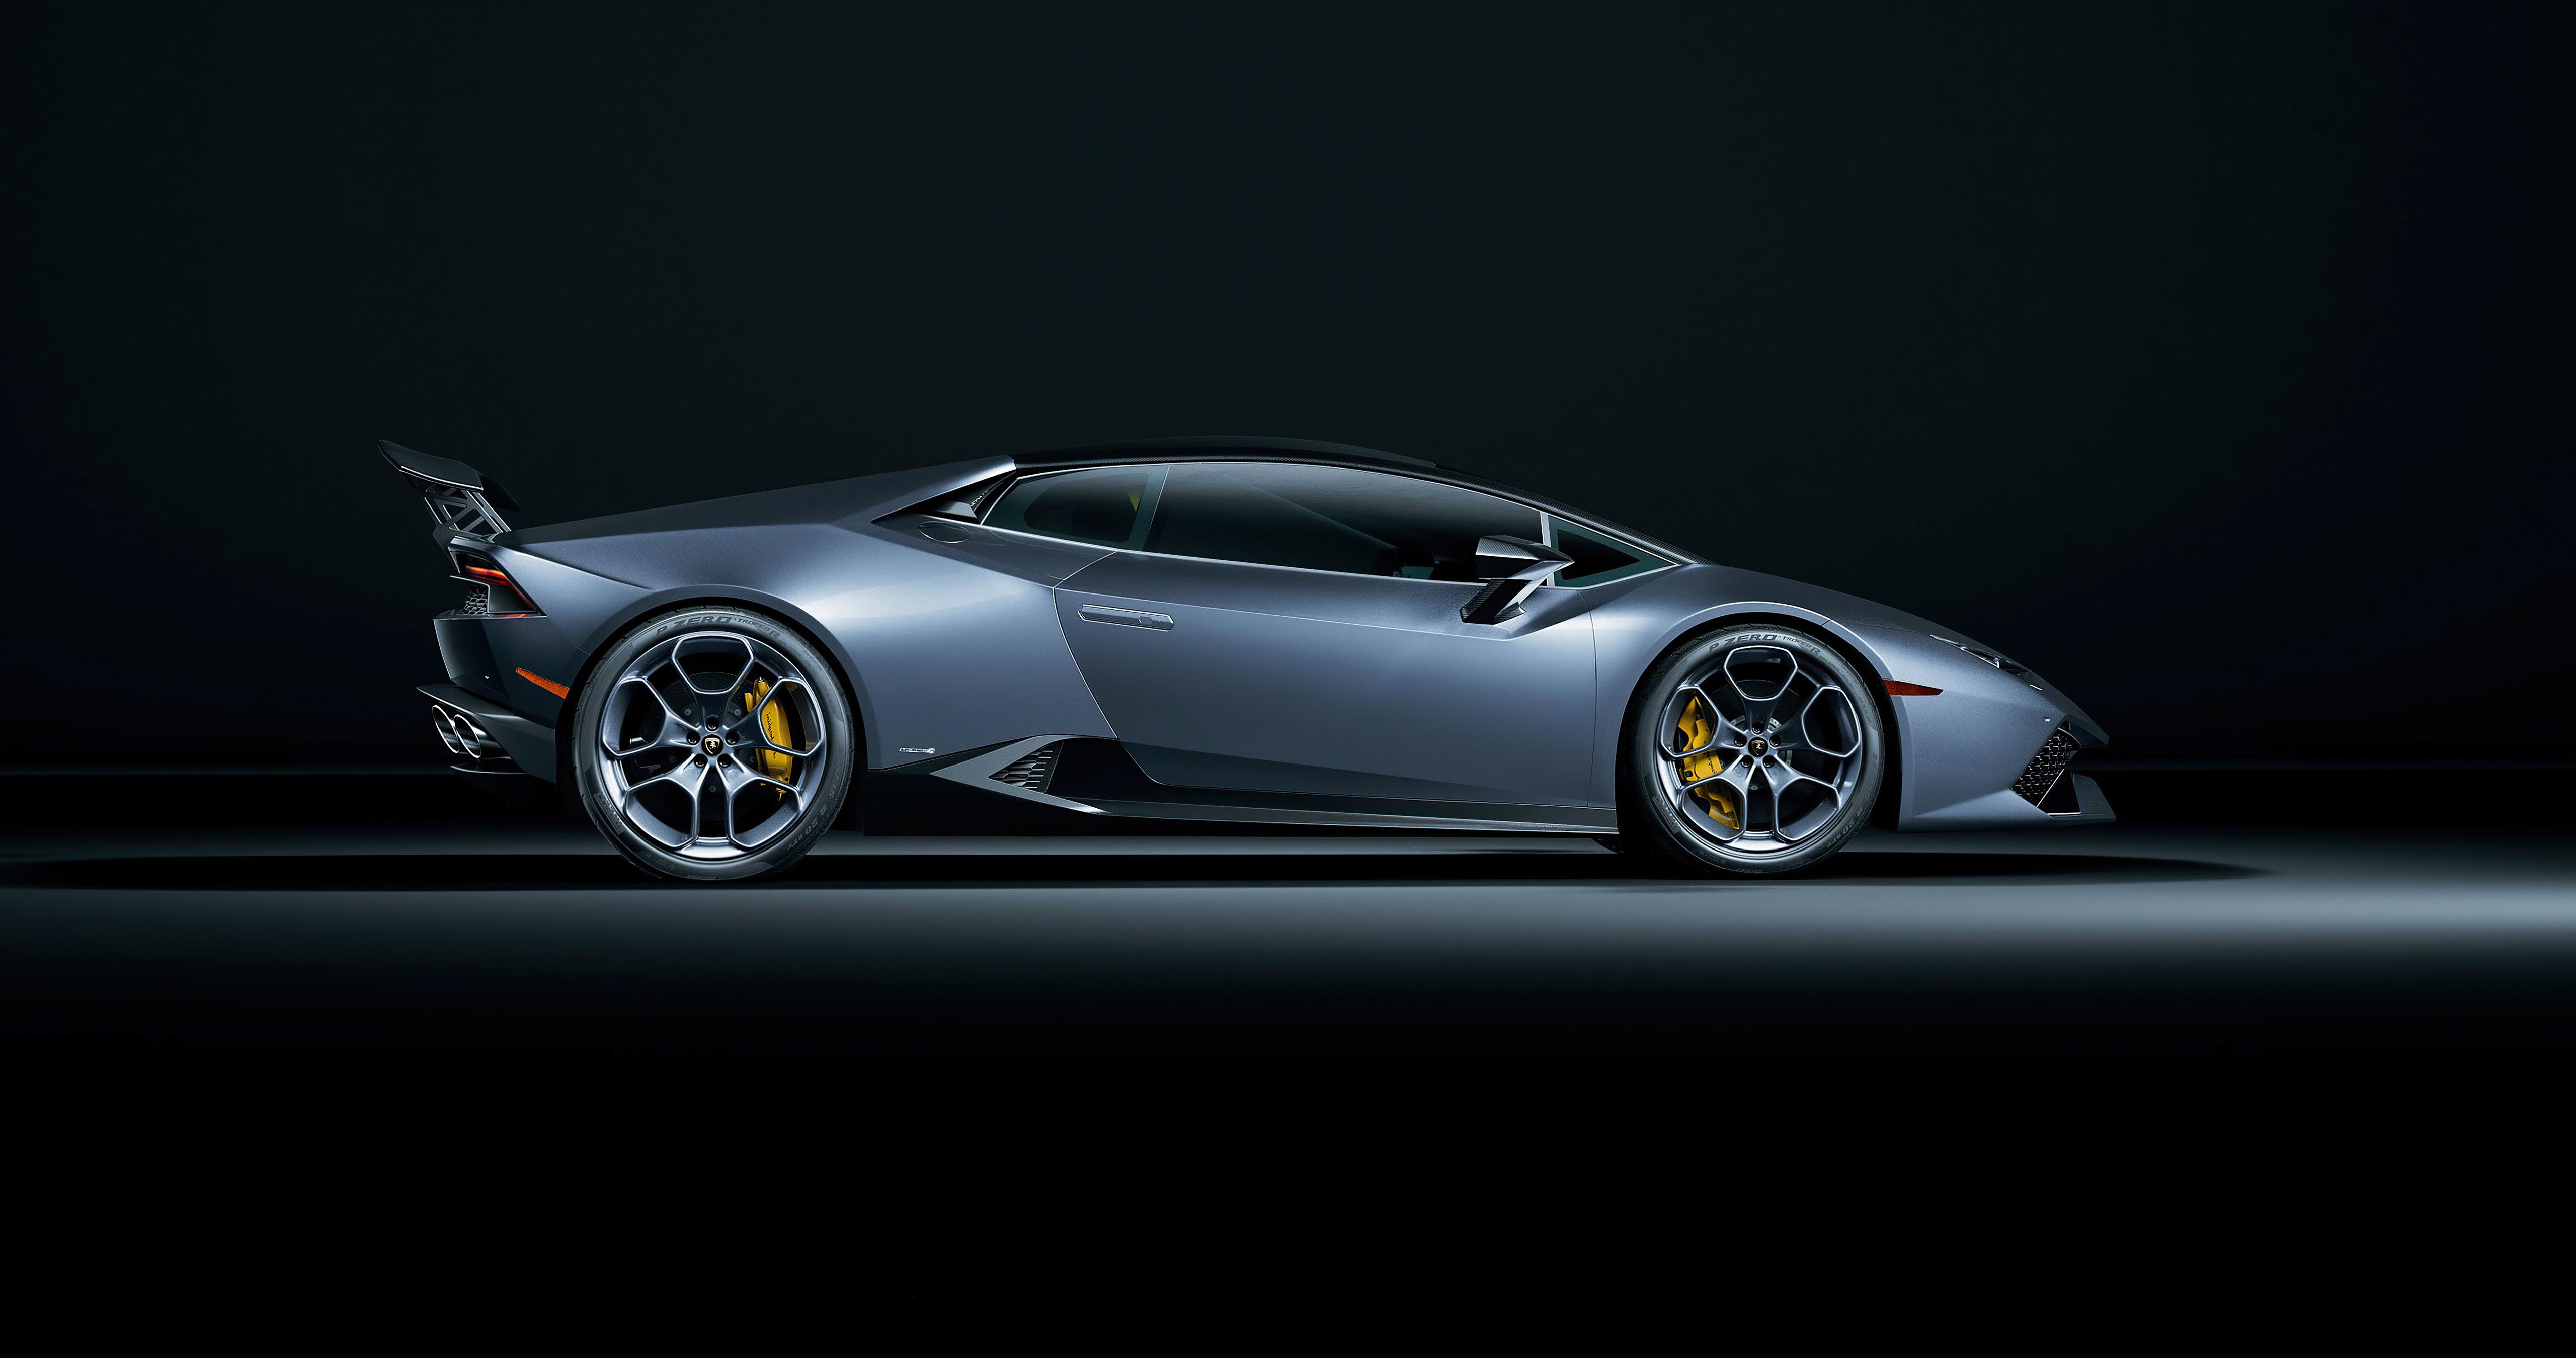 lamborghini huracan side view 4k 1626180240 - Lamborghini Huracan Side View 4k - Lamborghini Huracan Side View 4k wallpapers